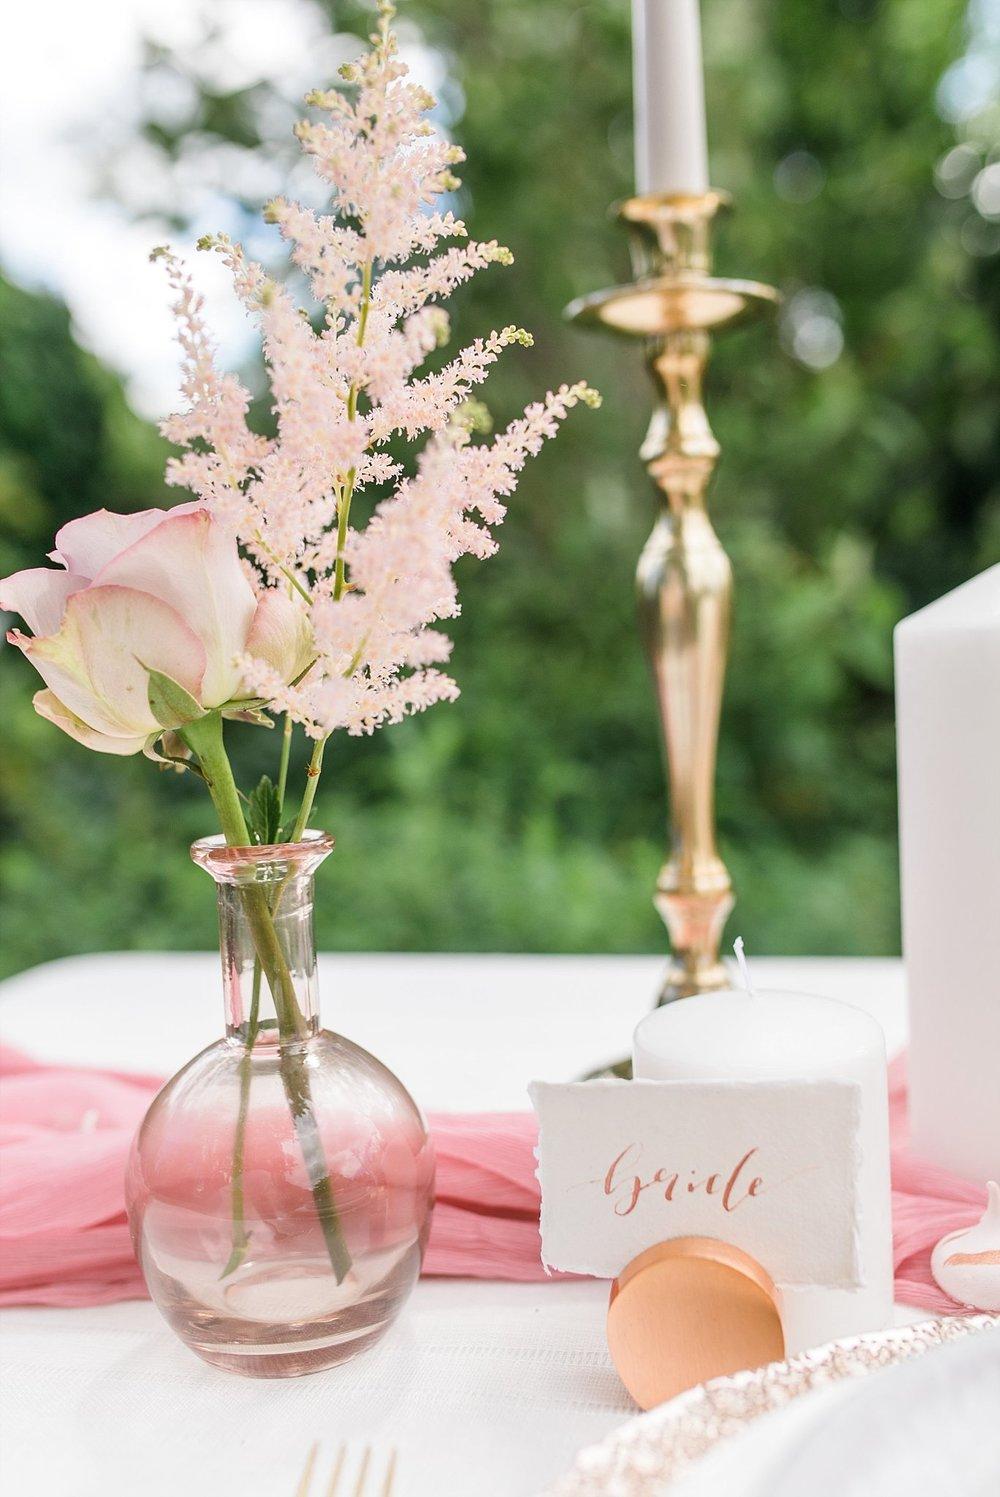 Wedding Stationery:  Wonderland Invites  | Styling:  Rock the Day  &  Wilma Event Design  | Photography:  Ryann Lindsey